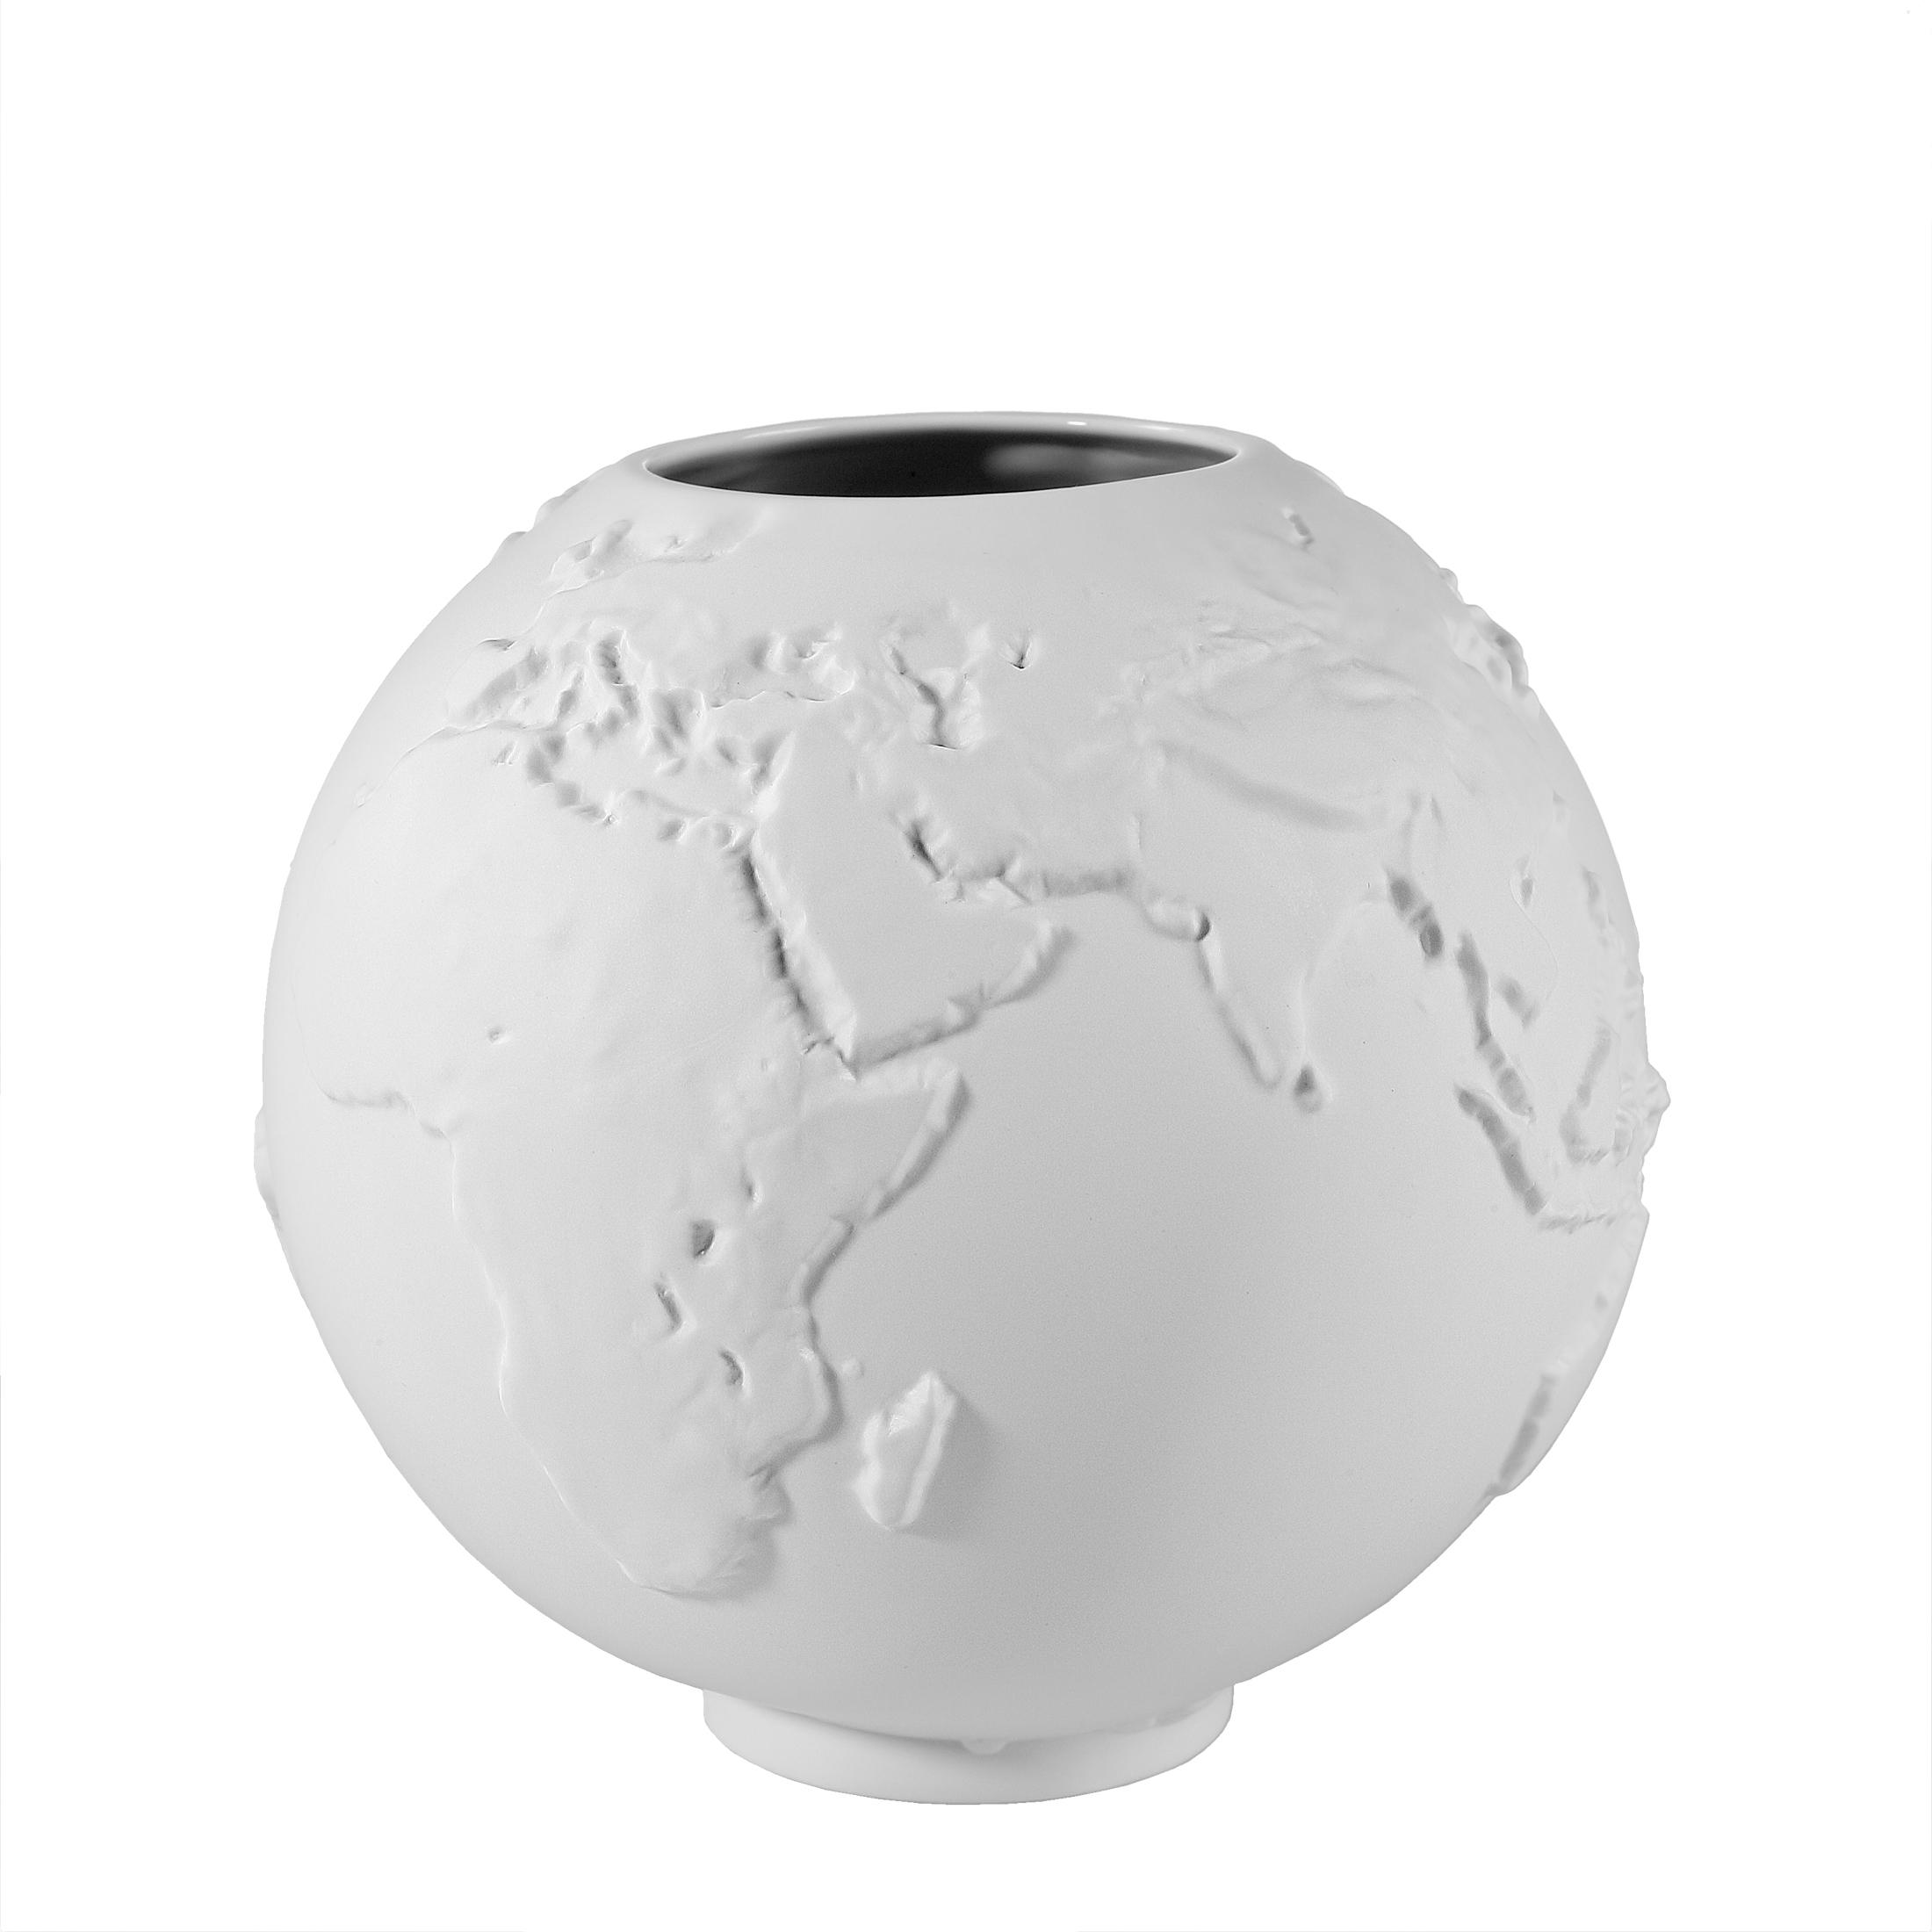 Goebel Kaiser Porzellan Globe 'KP P VA Globe 17' 2021 !